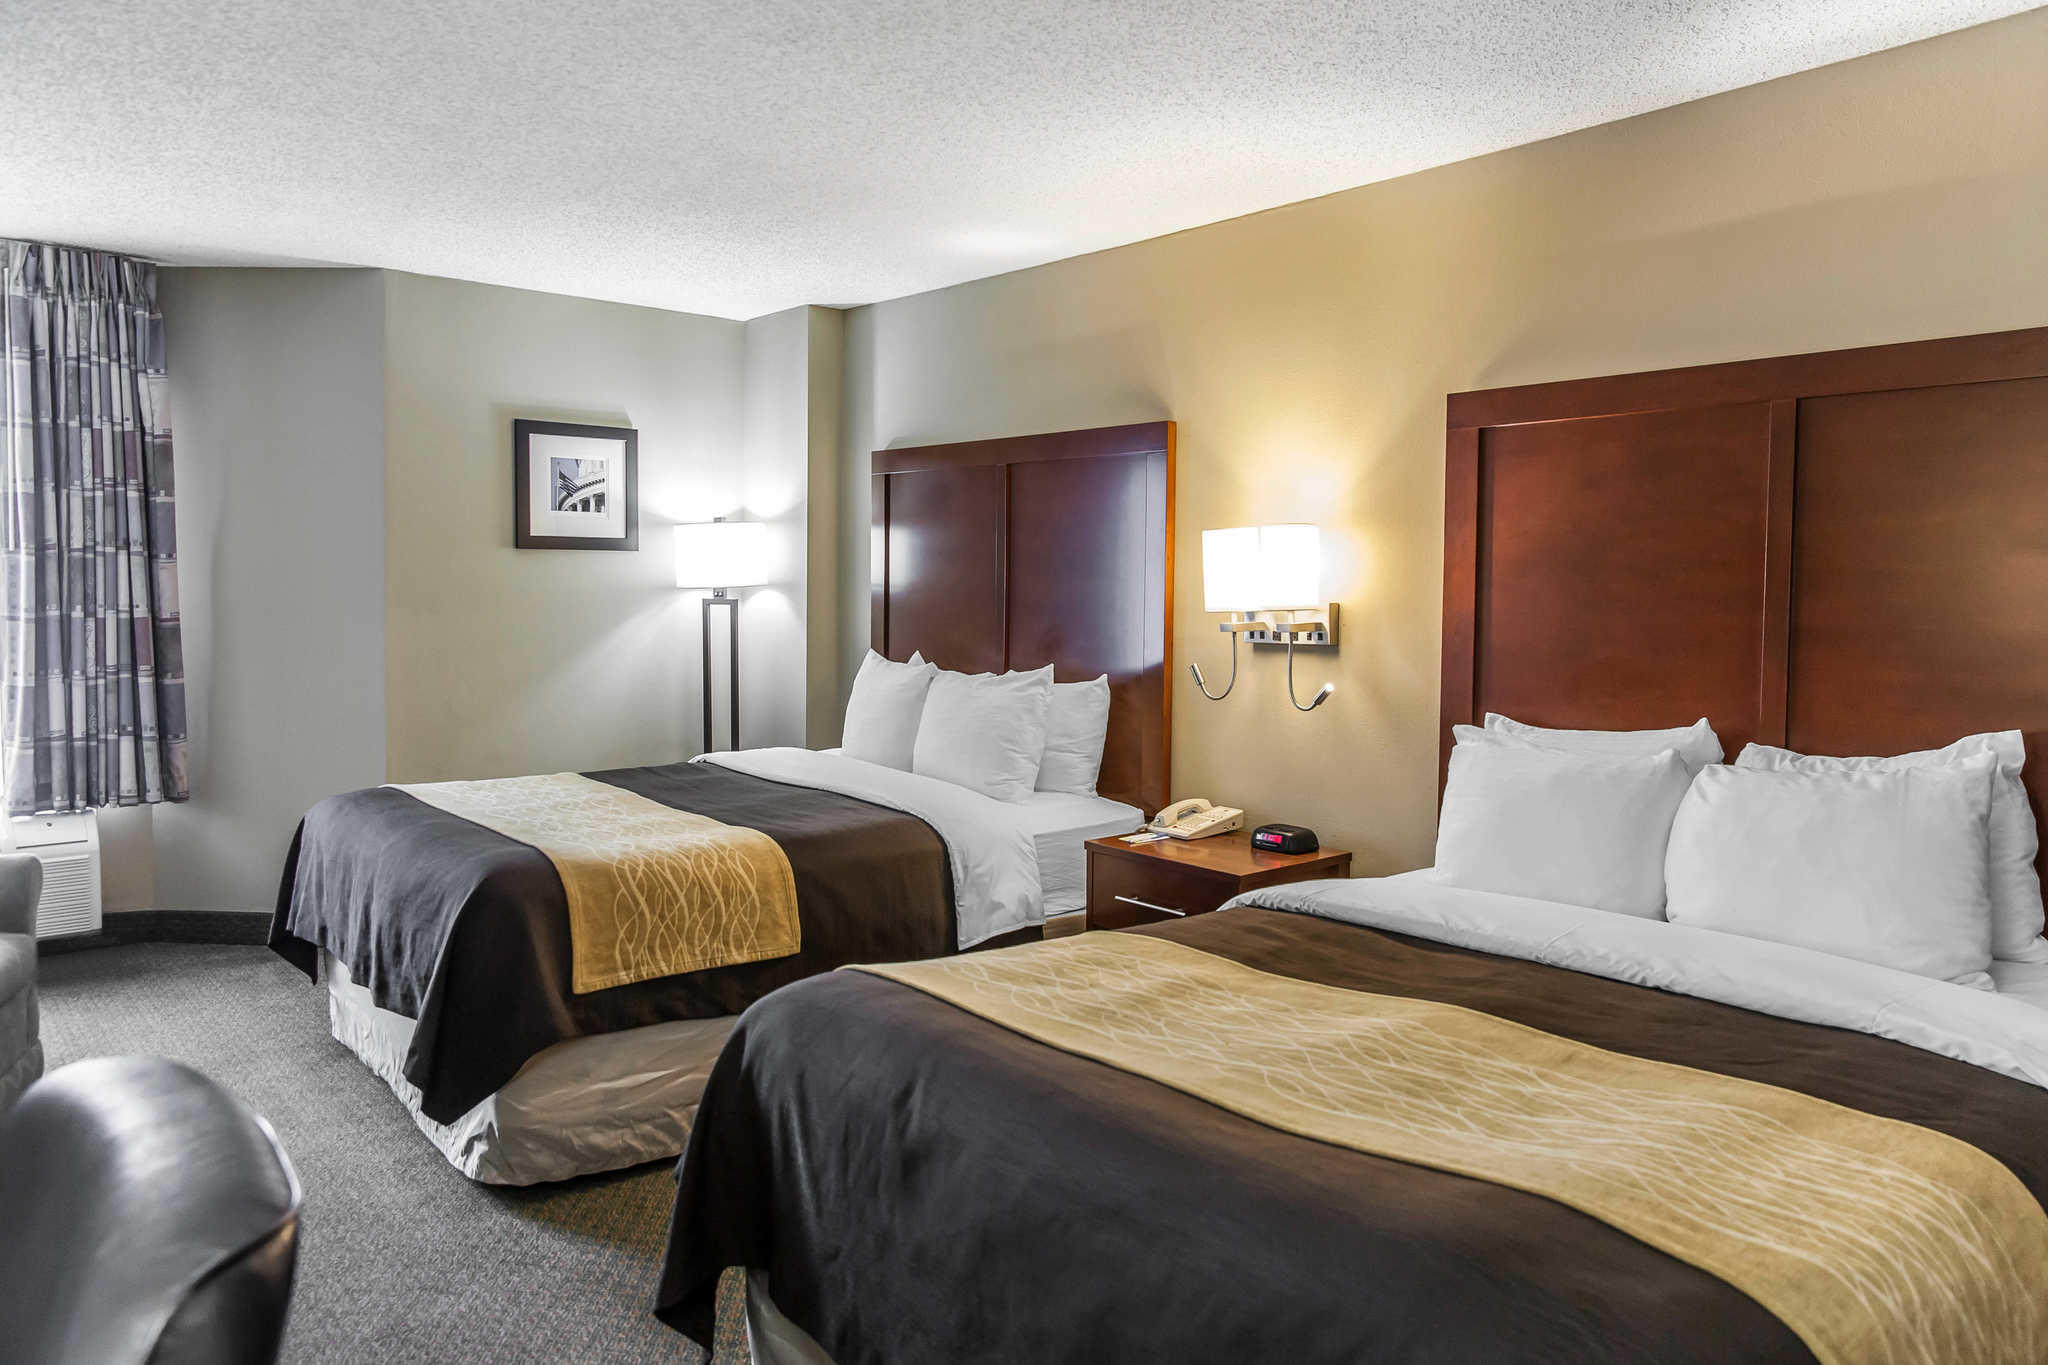 Meeting Rooms For Rent In Arlington Va